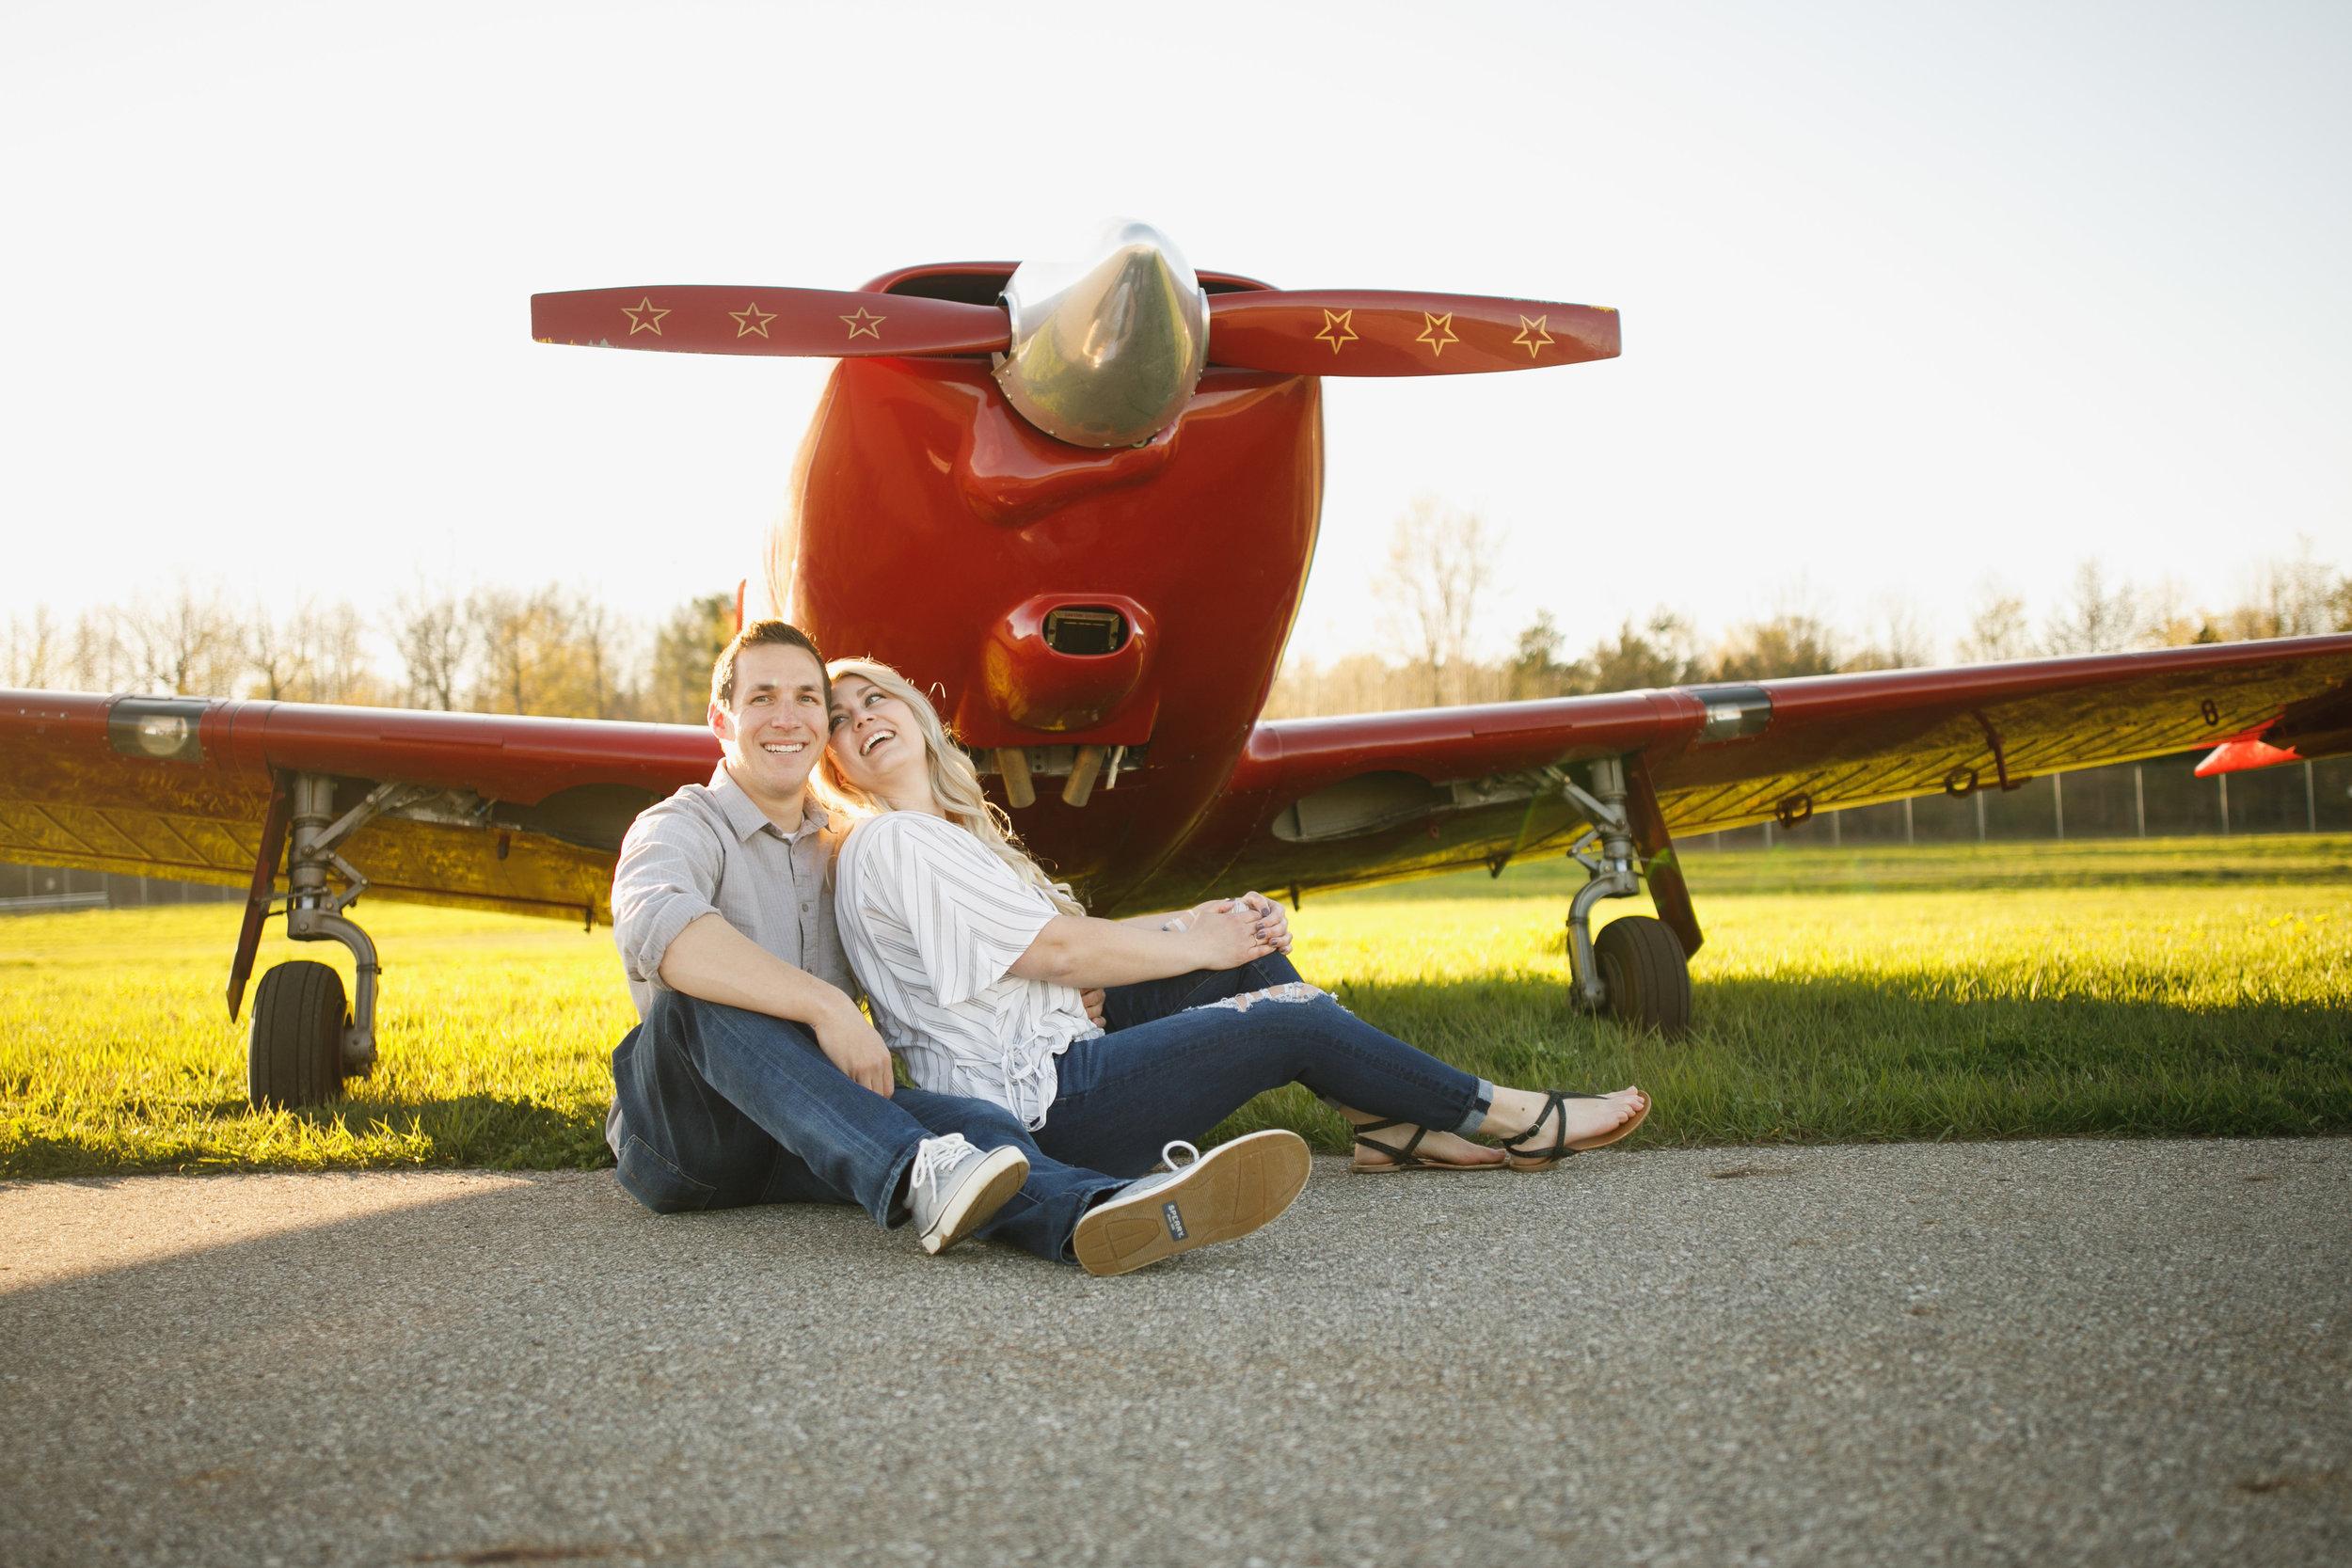 Grand Rapids Photographer - J Darling Photo - jessica darling - grand rapids wedding photographer - sparta airport - sparta michigan - jasmine and jeff engaged 026.jpg